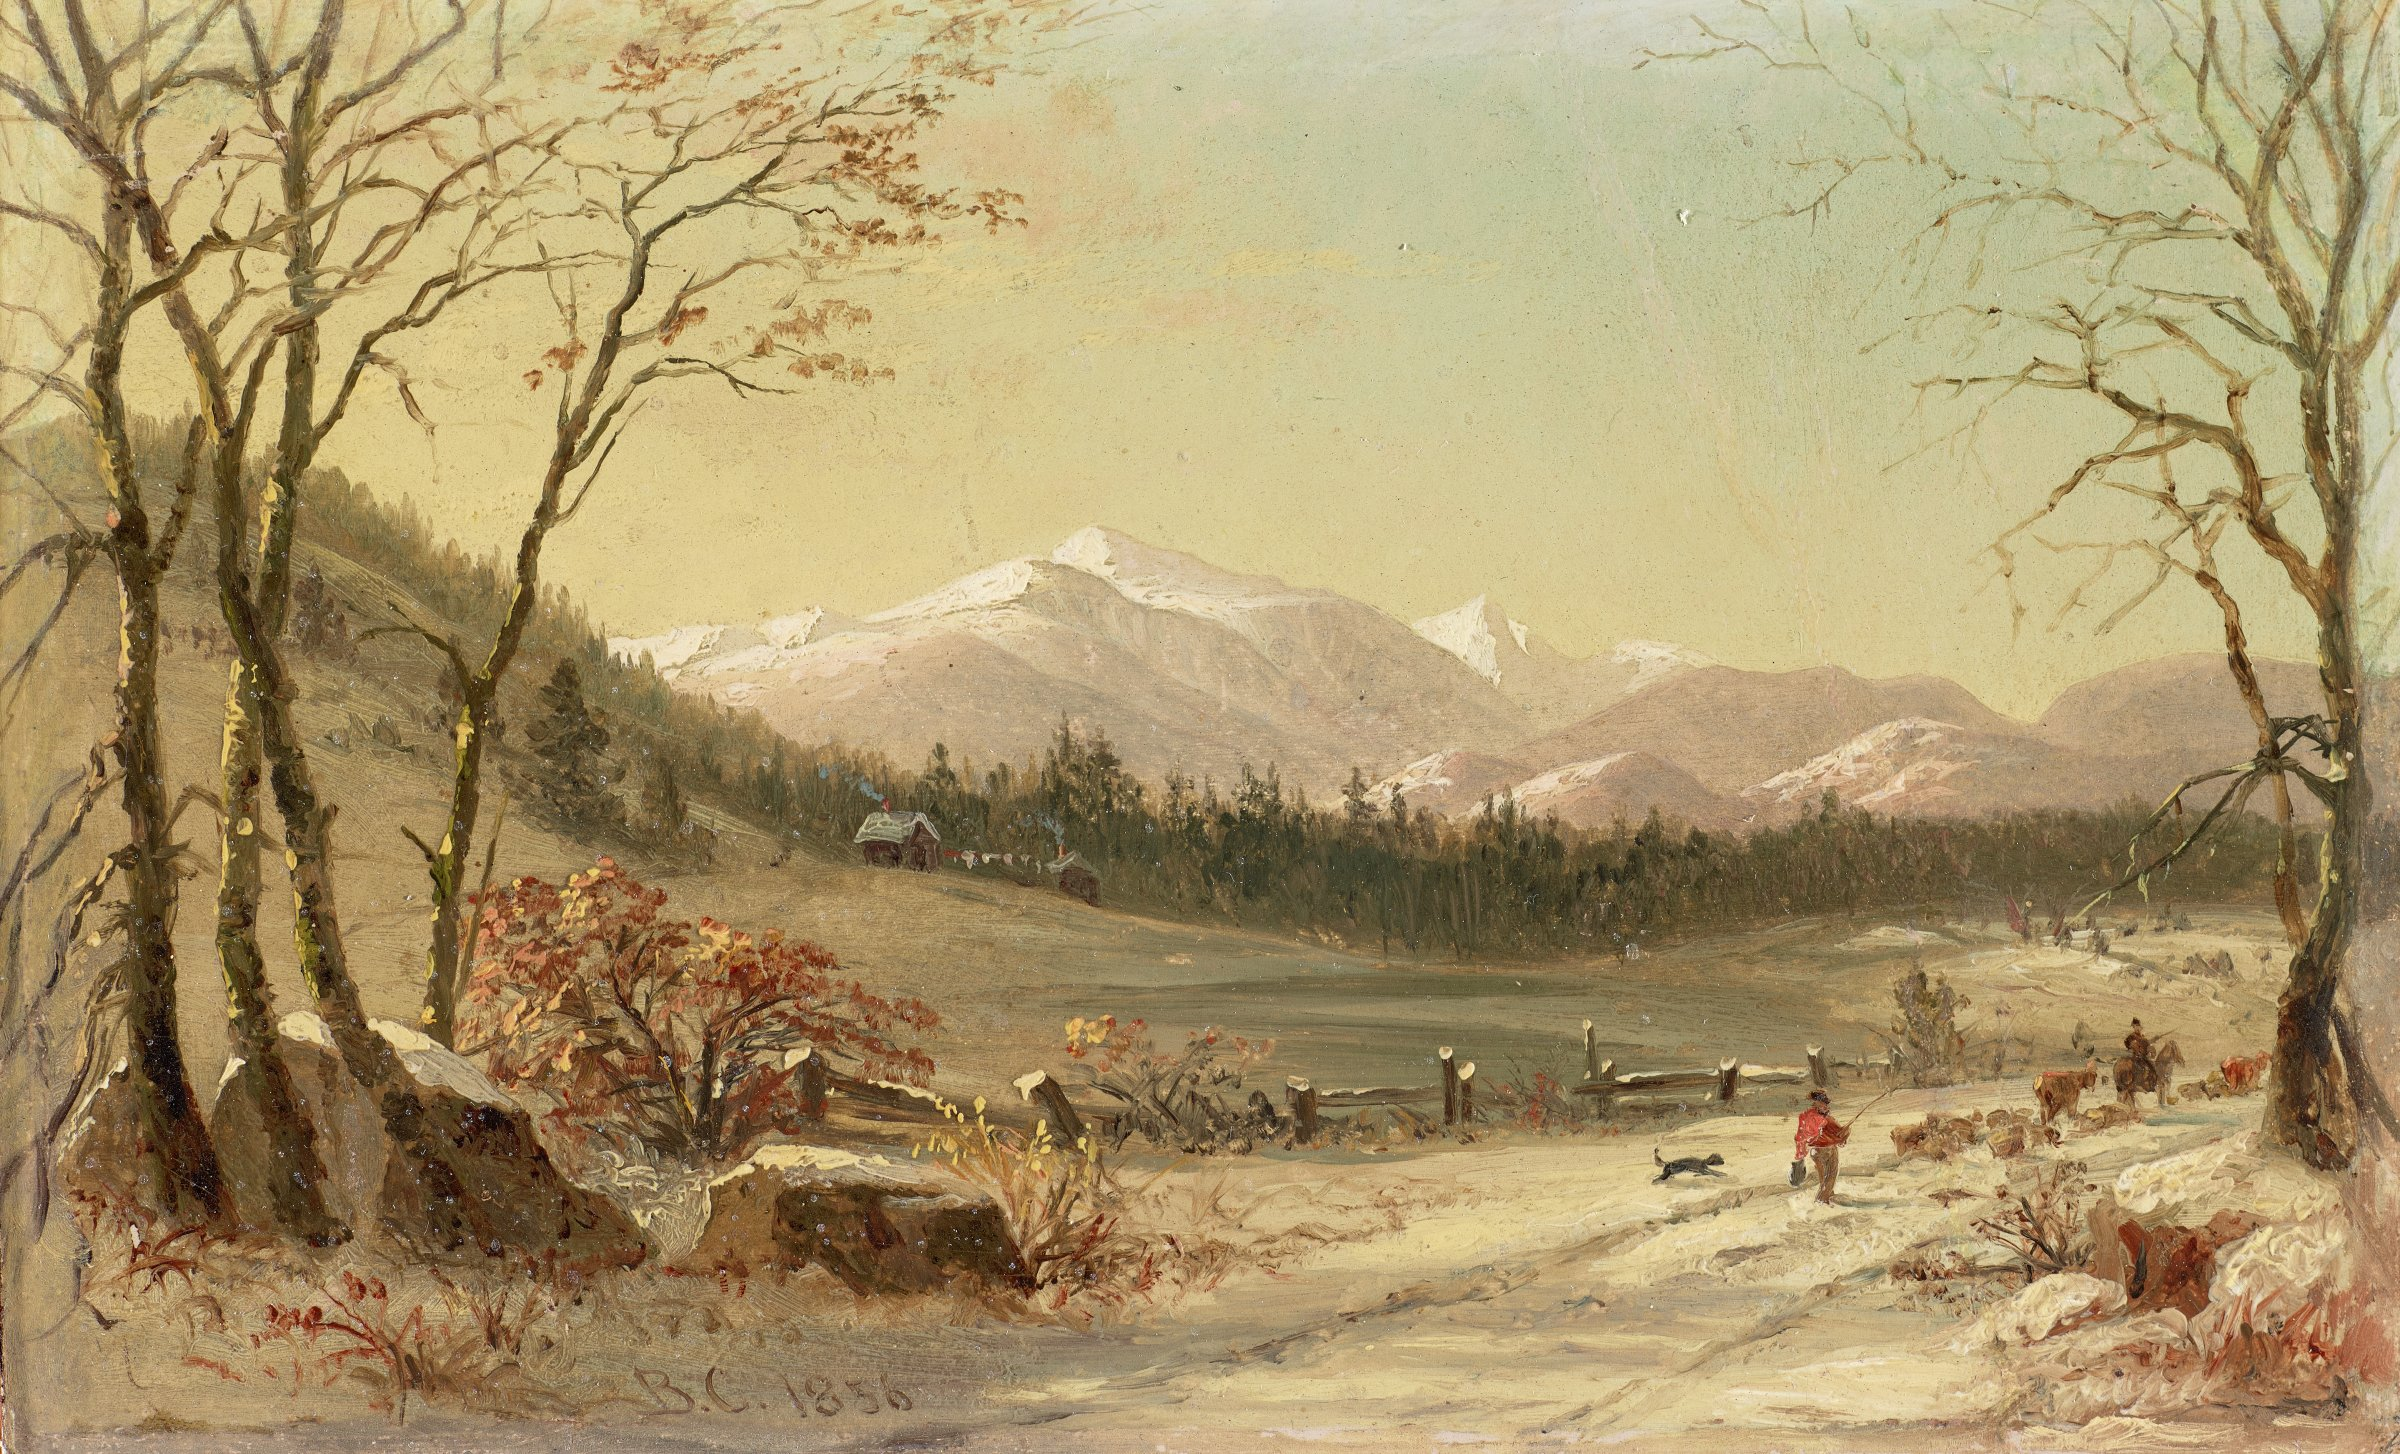 White Mountains (Winter Scene), Benjamin Champney, oil on board